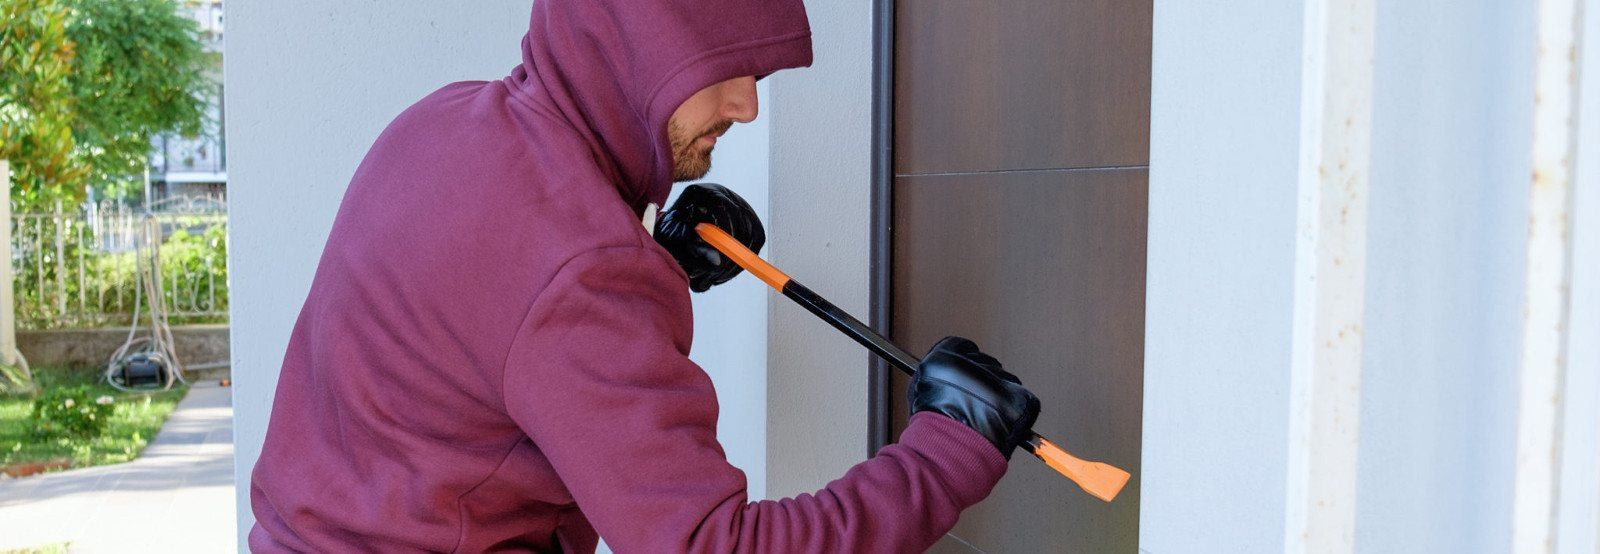 puertas antiokupa ladron hori - Alquiler Puertas Anti Okupa